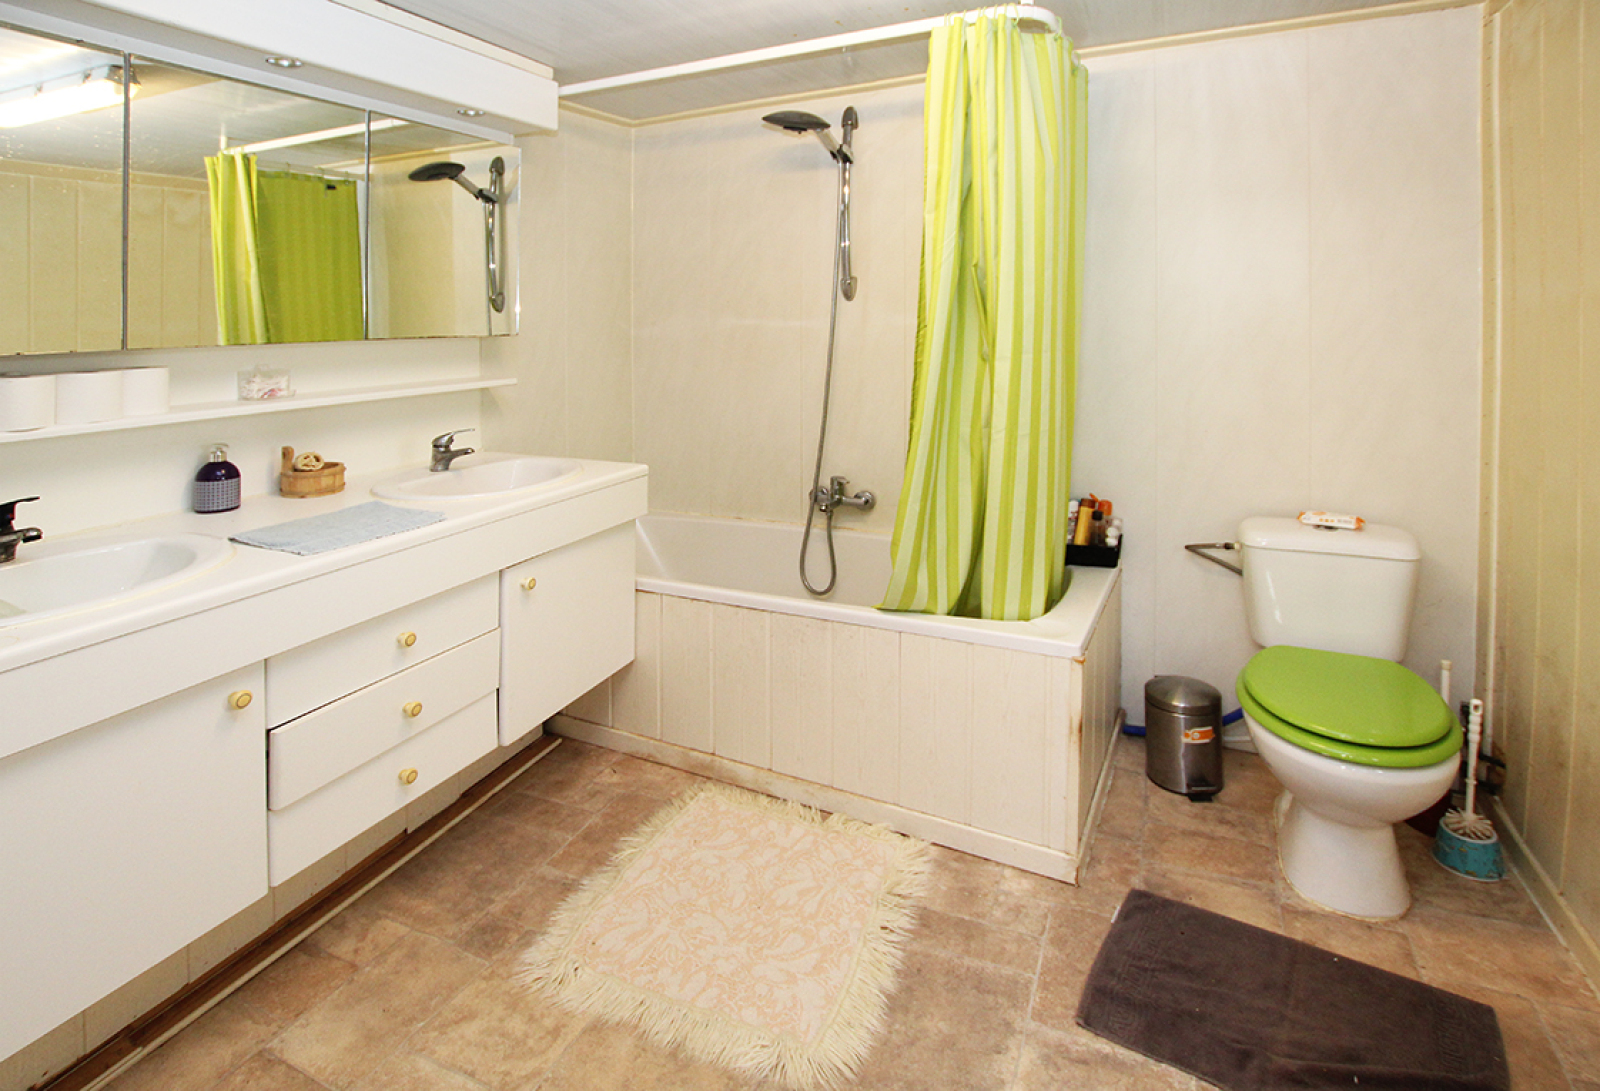 Volledig te renoveren eengezinswoning met twee slaapkamers, tuin en grote garage te Rumst! afbeelding 5